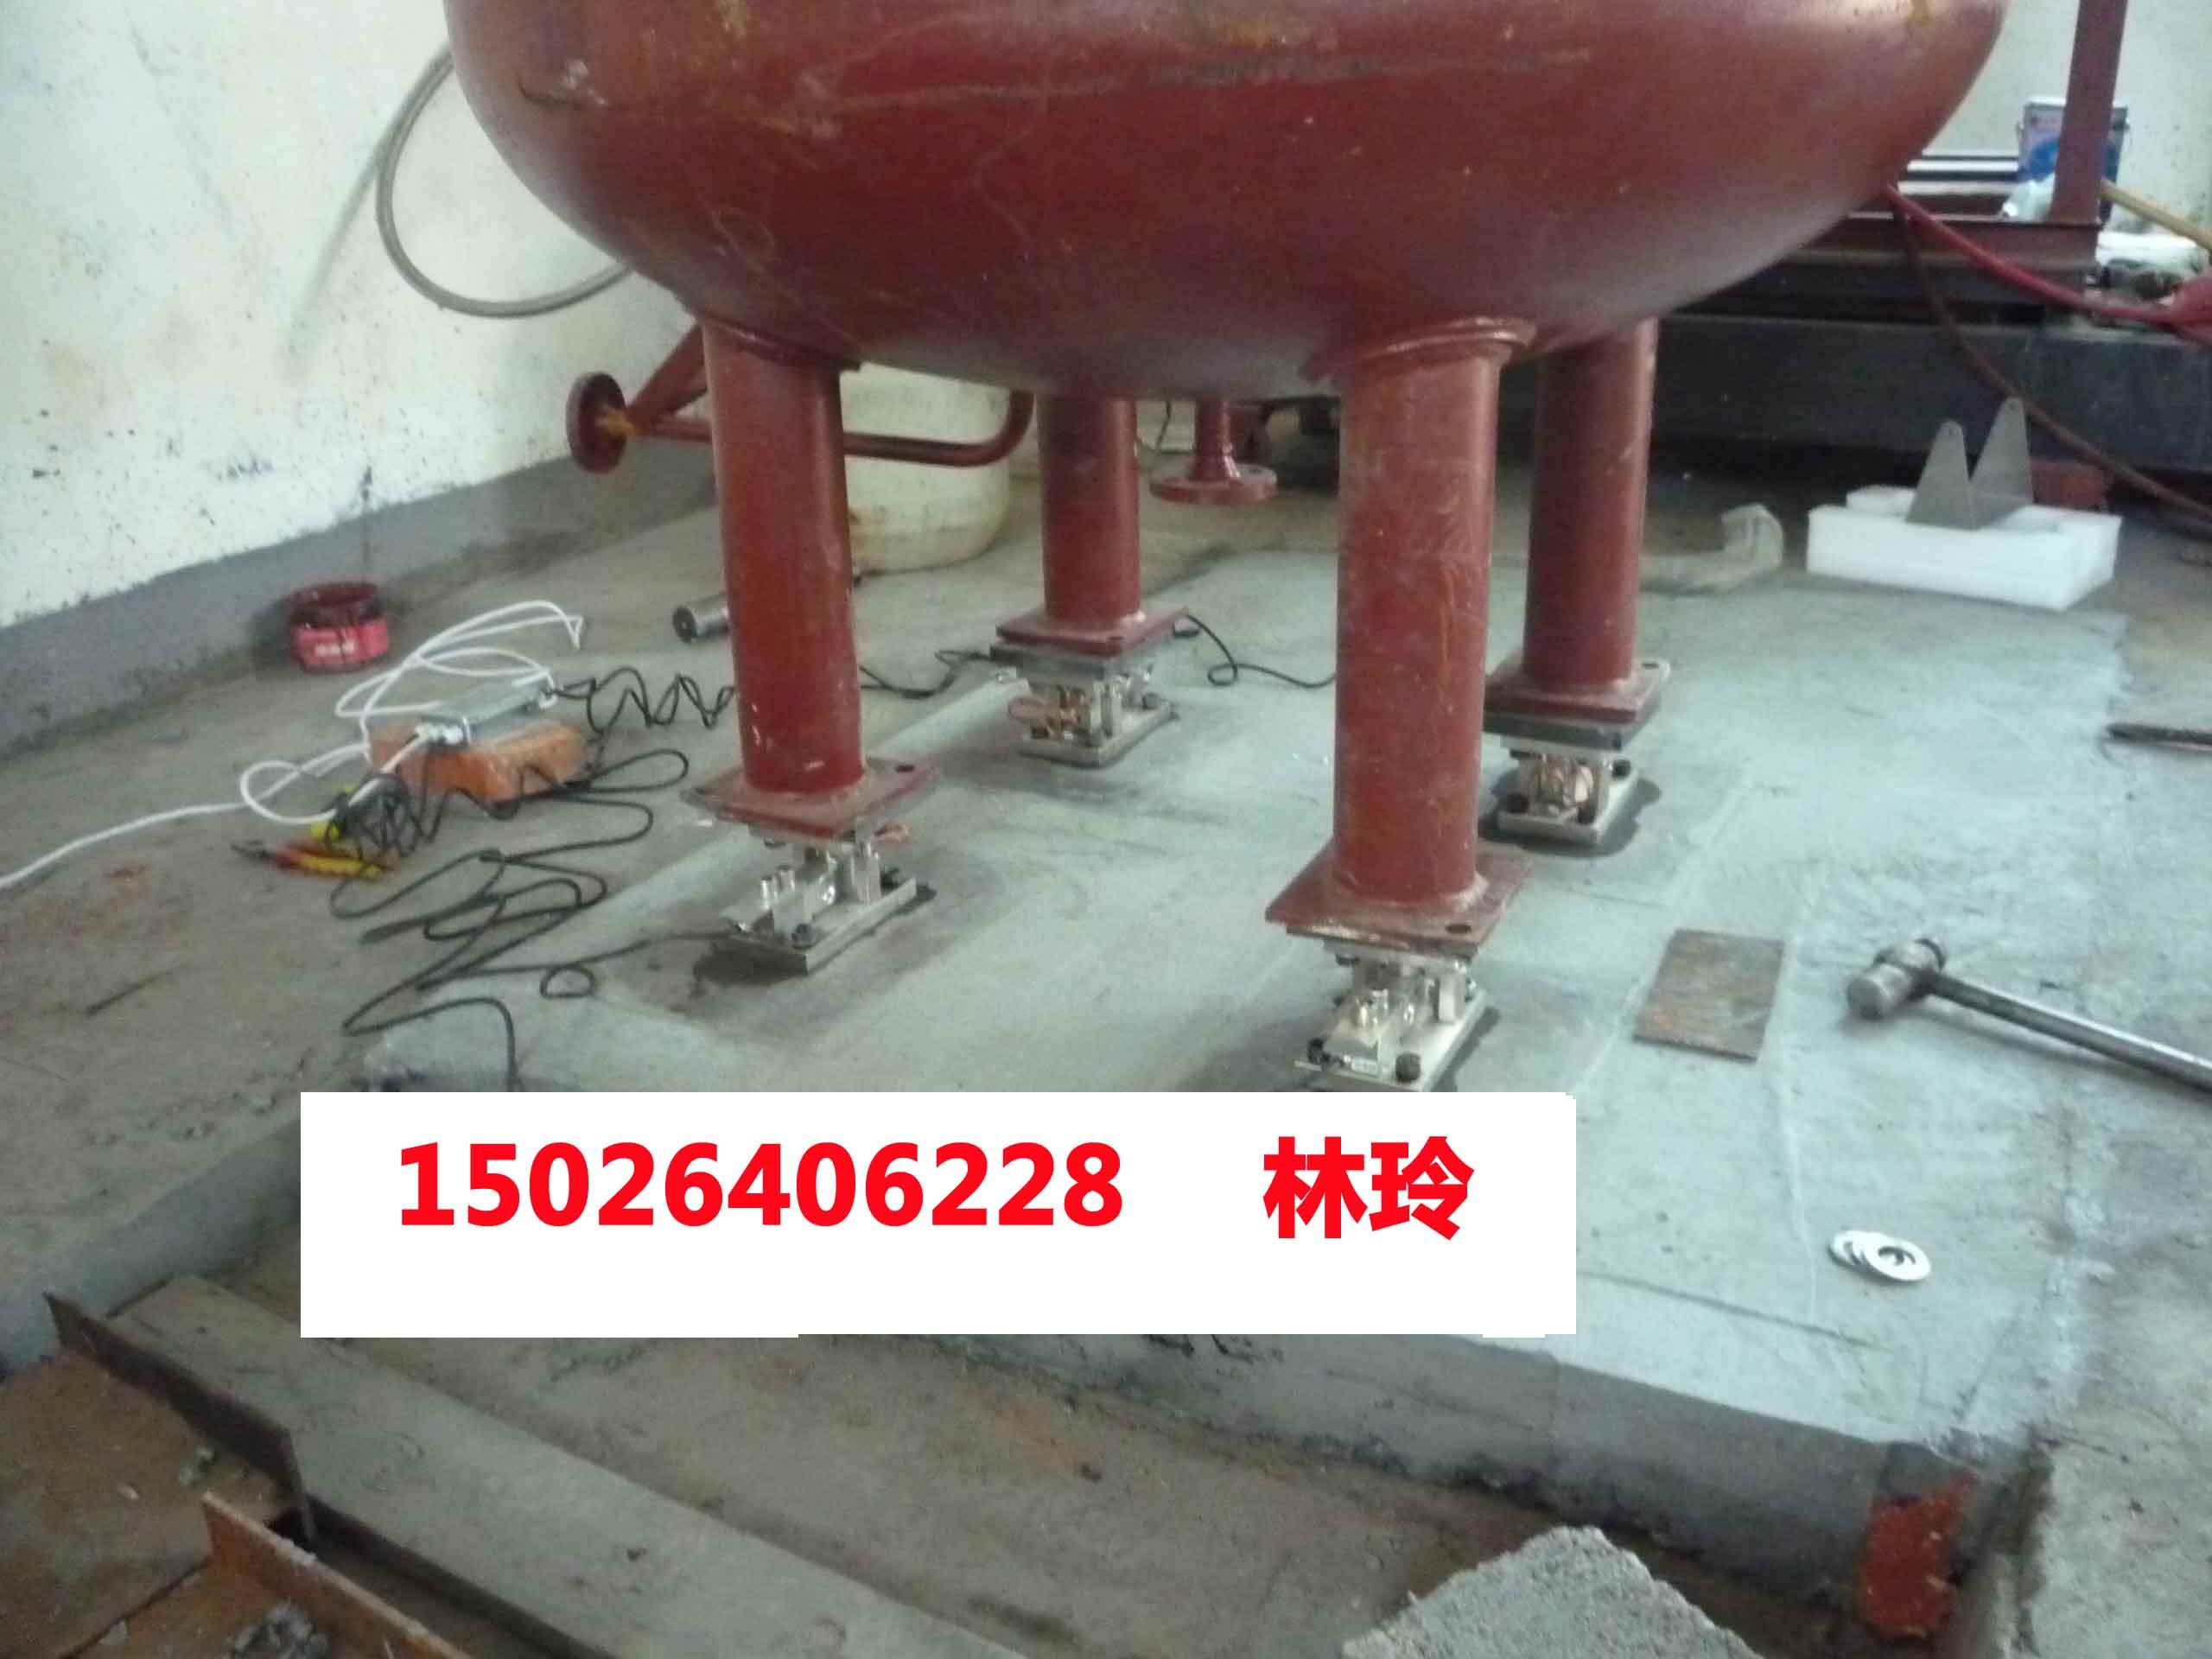 SR是为下列应用而优化配置的: 筒仓或料仓的填充料位监视; 吊车及缆绳负荷的测量,其它力的测量; 工业电梯或轧机机组的负荷测量; 有爆炸危险区域内的称重(利用SIWAREX IS防爆接口); 皮带张力测量设备。 SR称重模块 订货号:7MH4920-0AA01 SR适用于以下场合: 起重机、缆线负载和其它需要测力的场合 工业电梯或滚动磨坊的负载测量 皮带张力测量设备 更多使用张力全桥作为传感器的场合 称重模块 在以下应用装配中效果最佳: 料斗仓的料位监视。 起重机和钢丝绳负载,其它张力测量。 工业升降机和